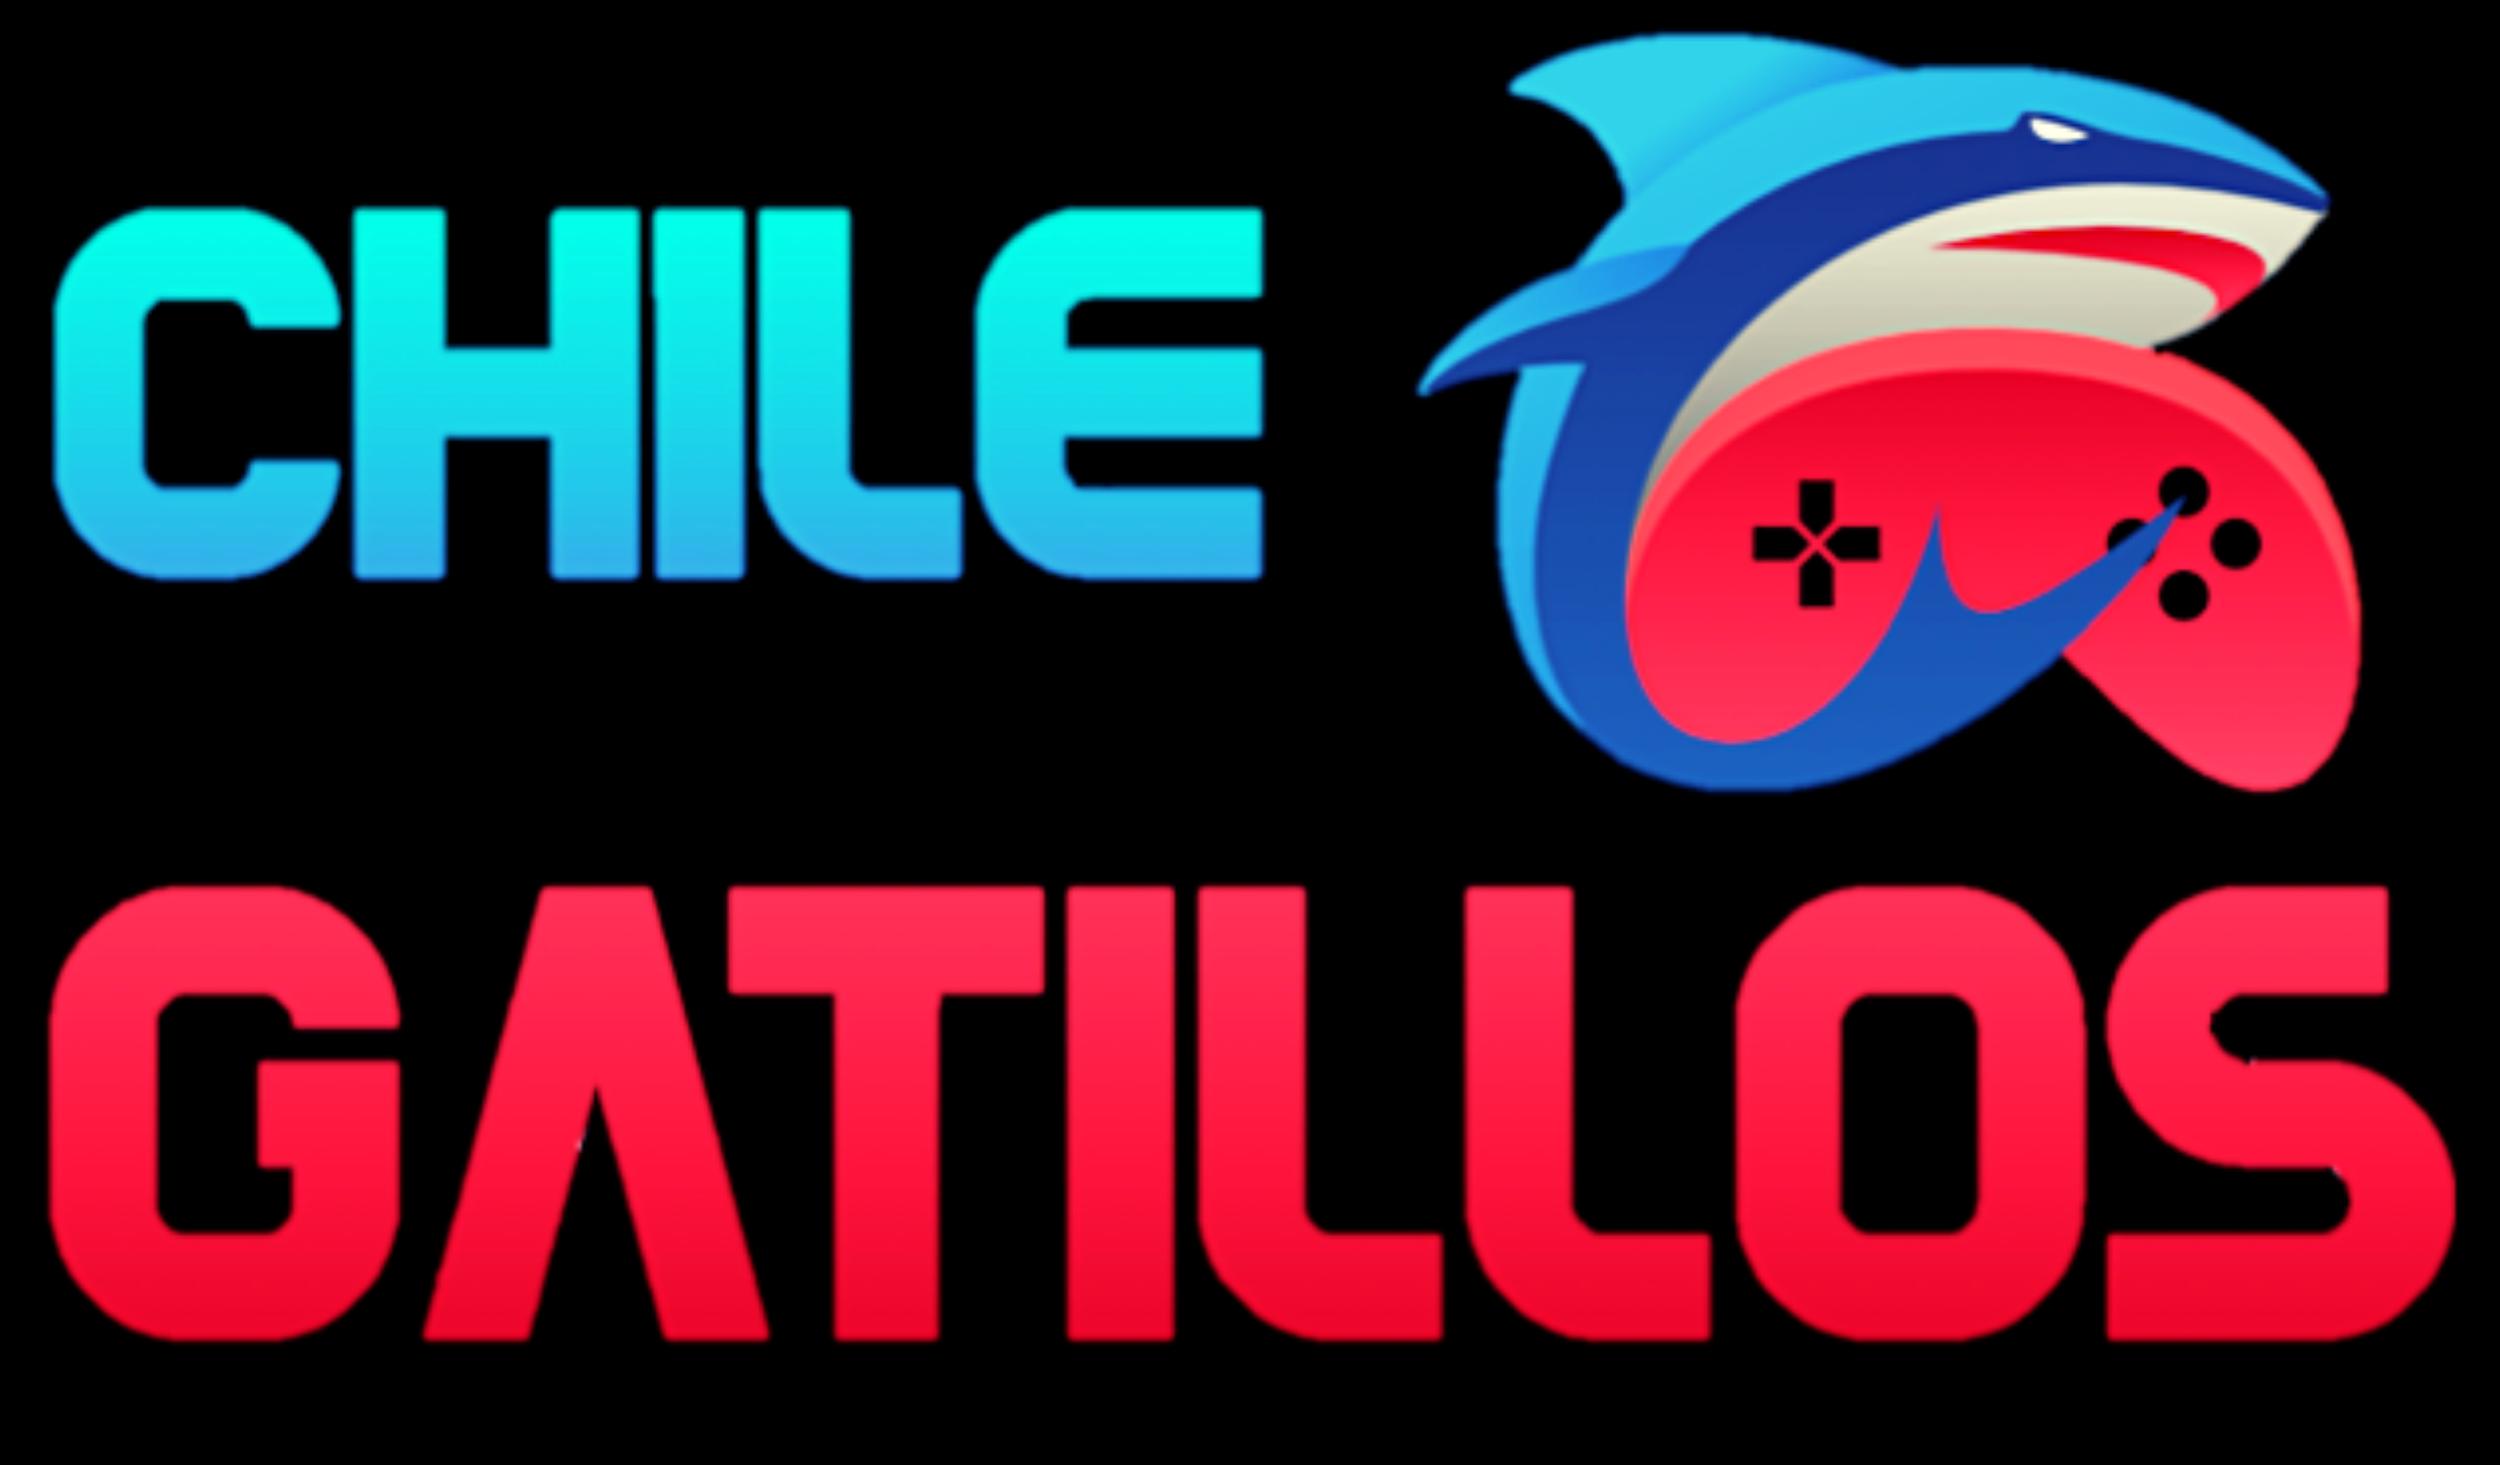 Chile Gatillos